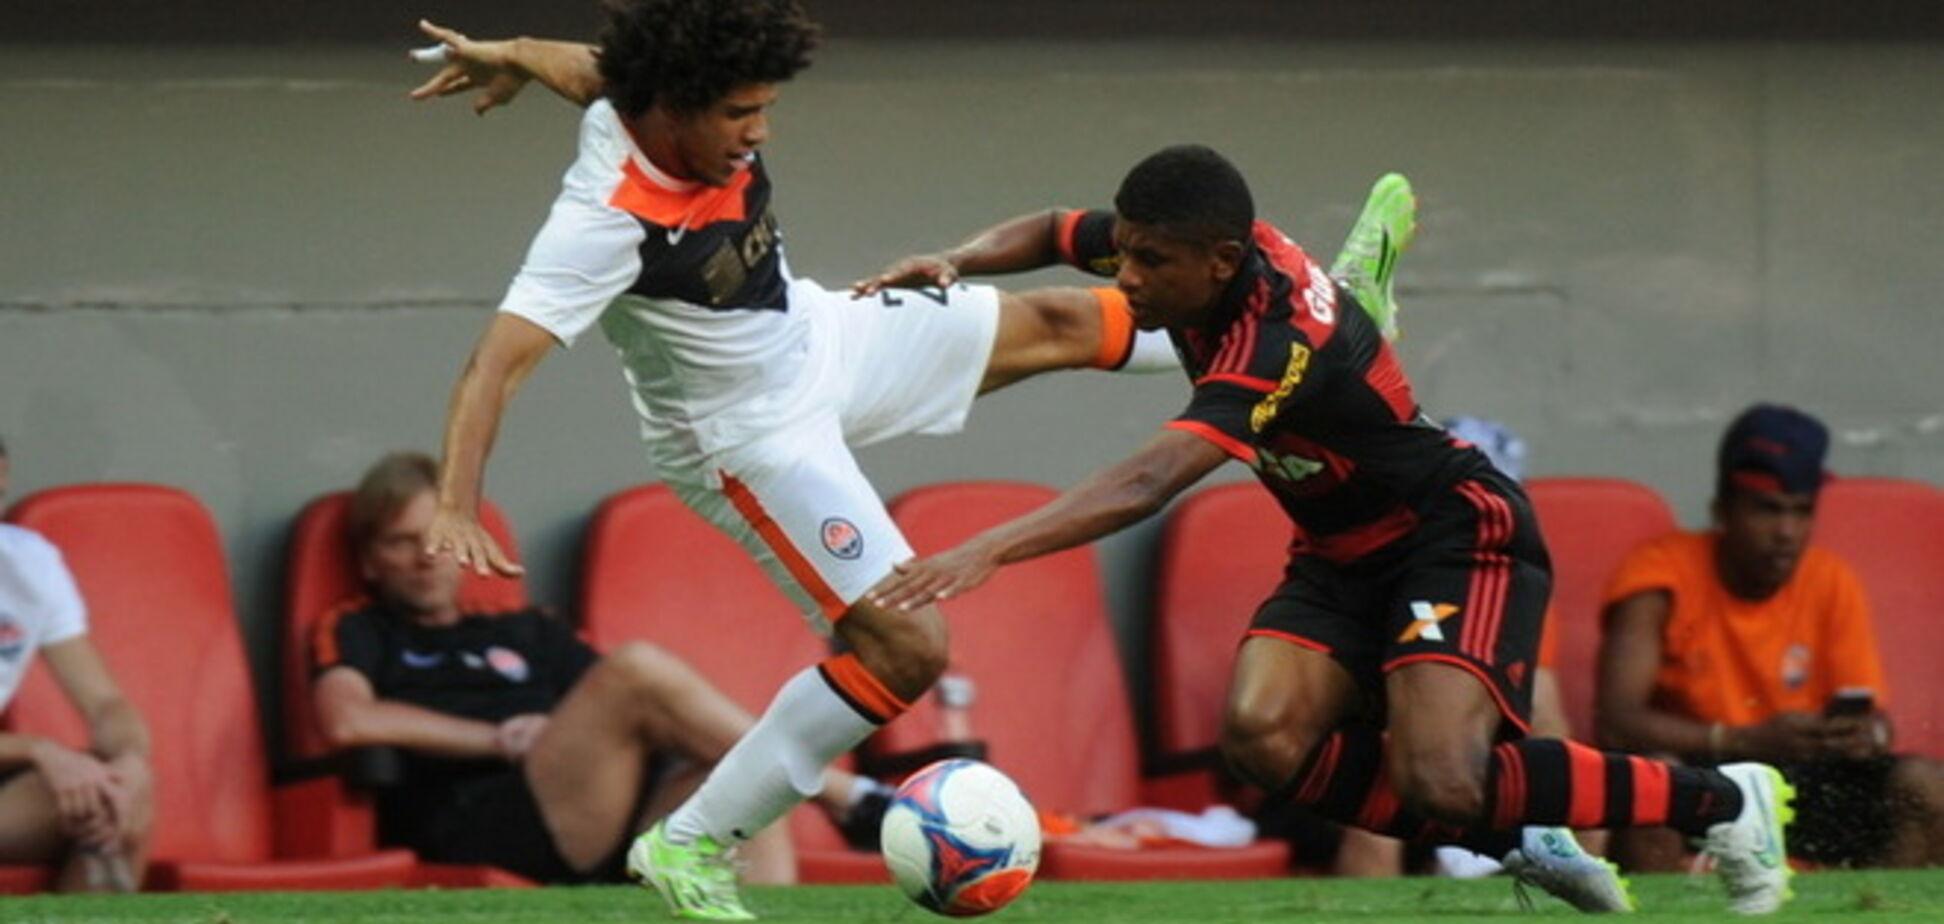 Шахтер - Фламенго - 0-0: видео-обзор матча